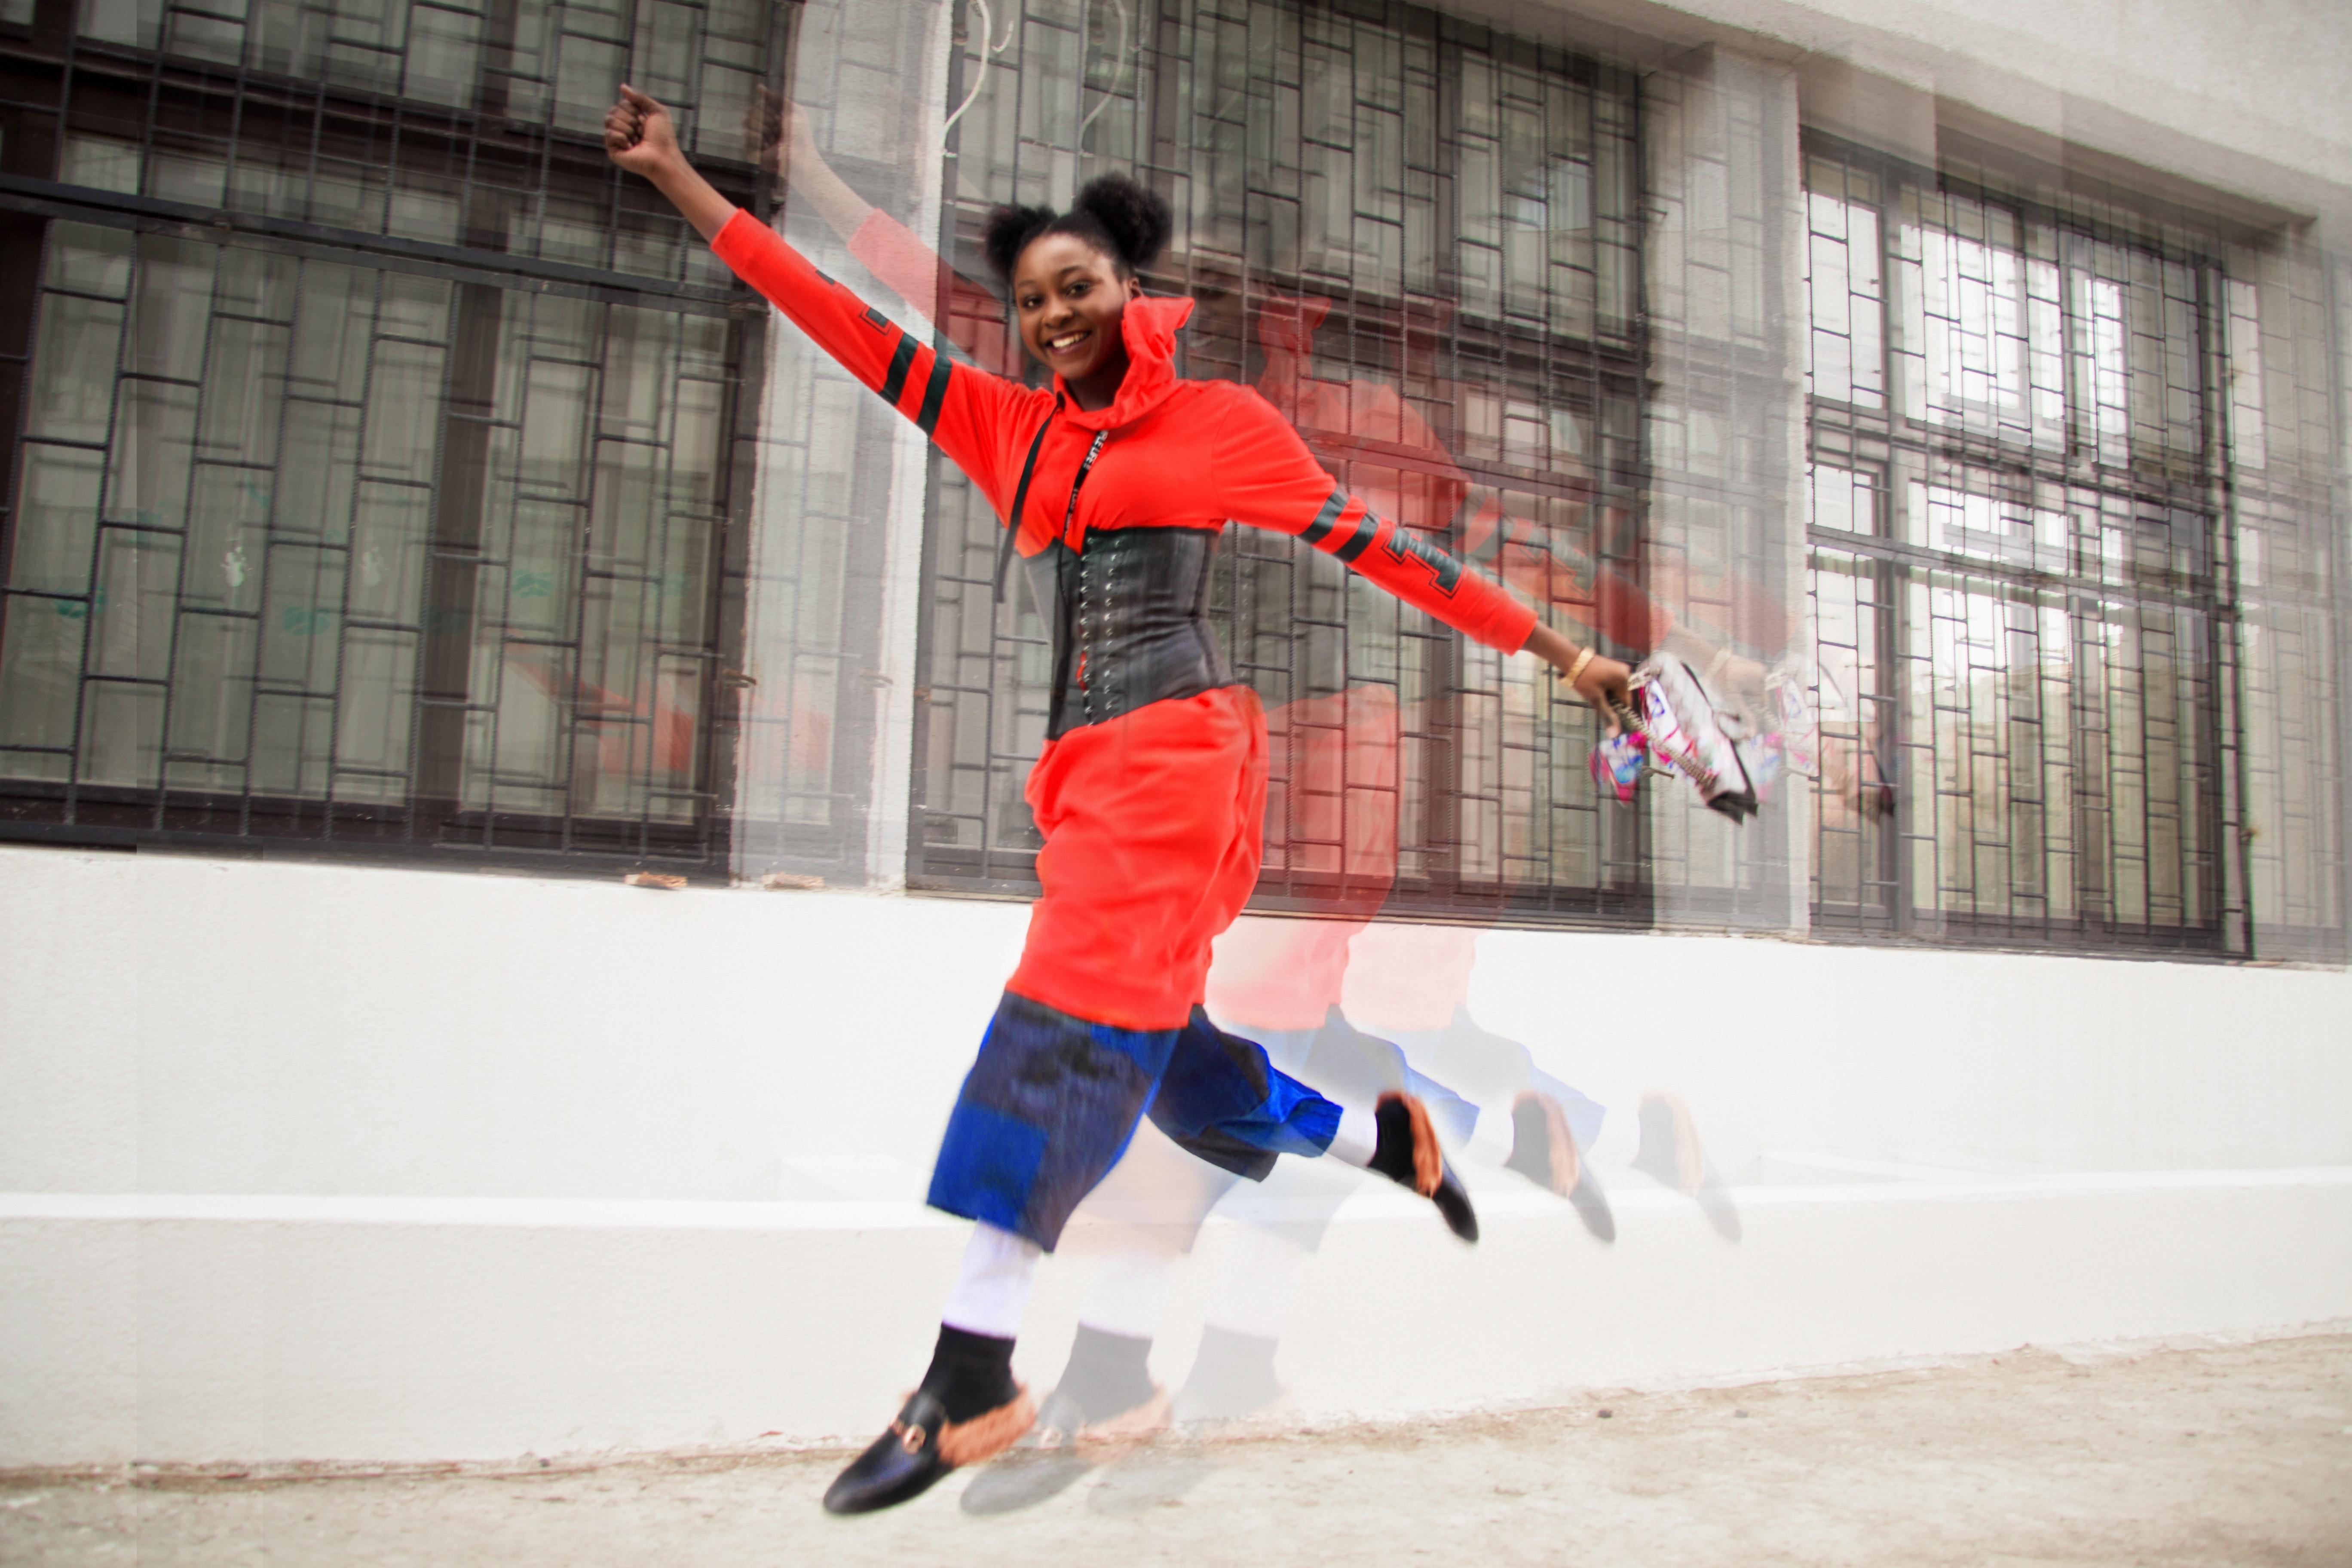 Woman wearing red dress jumping photo